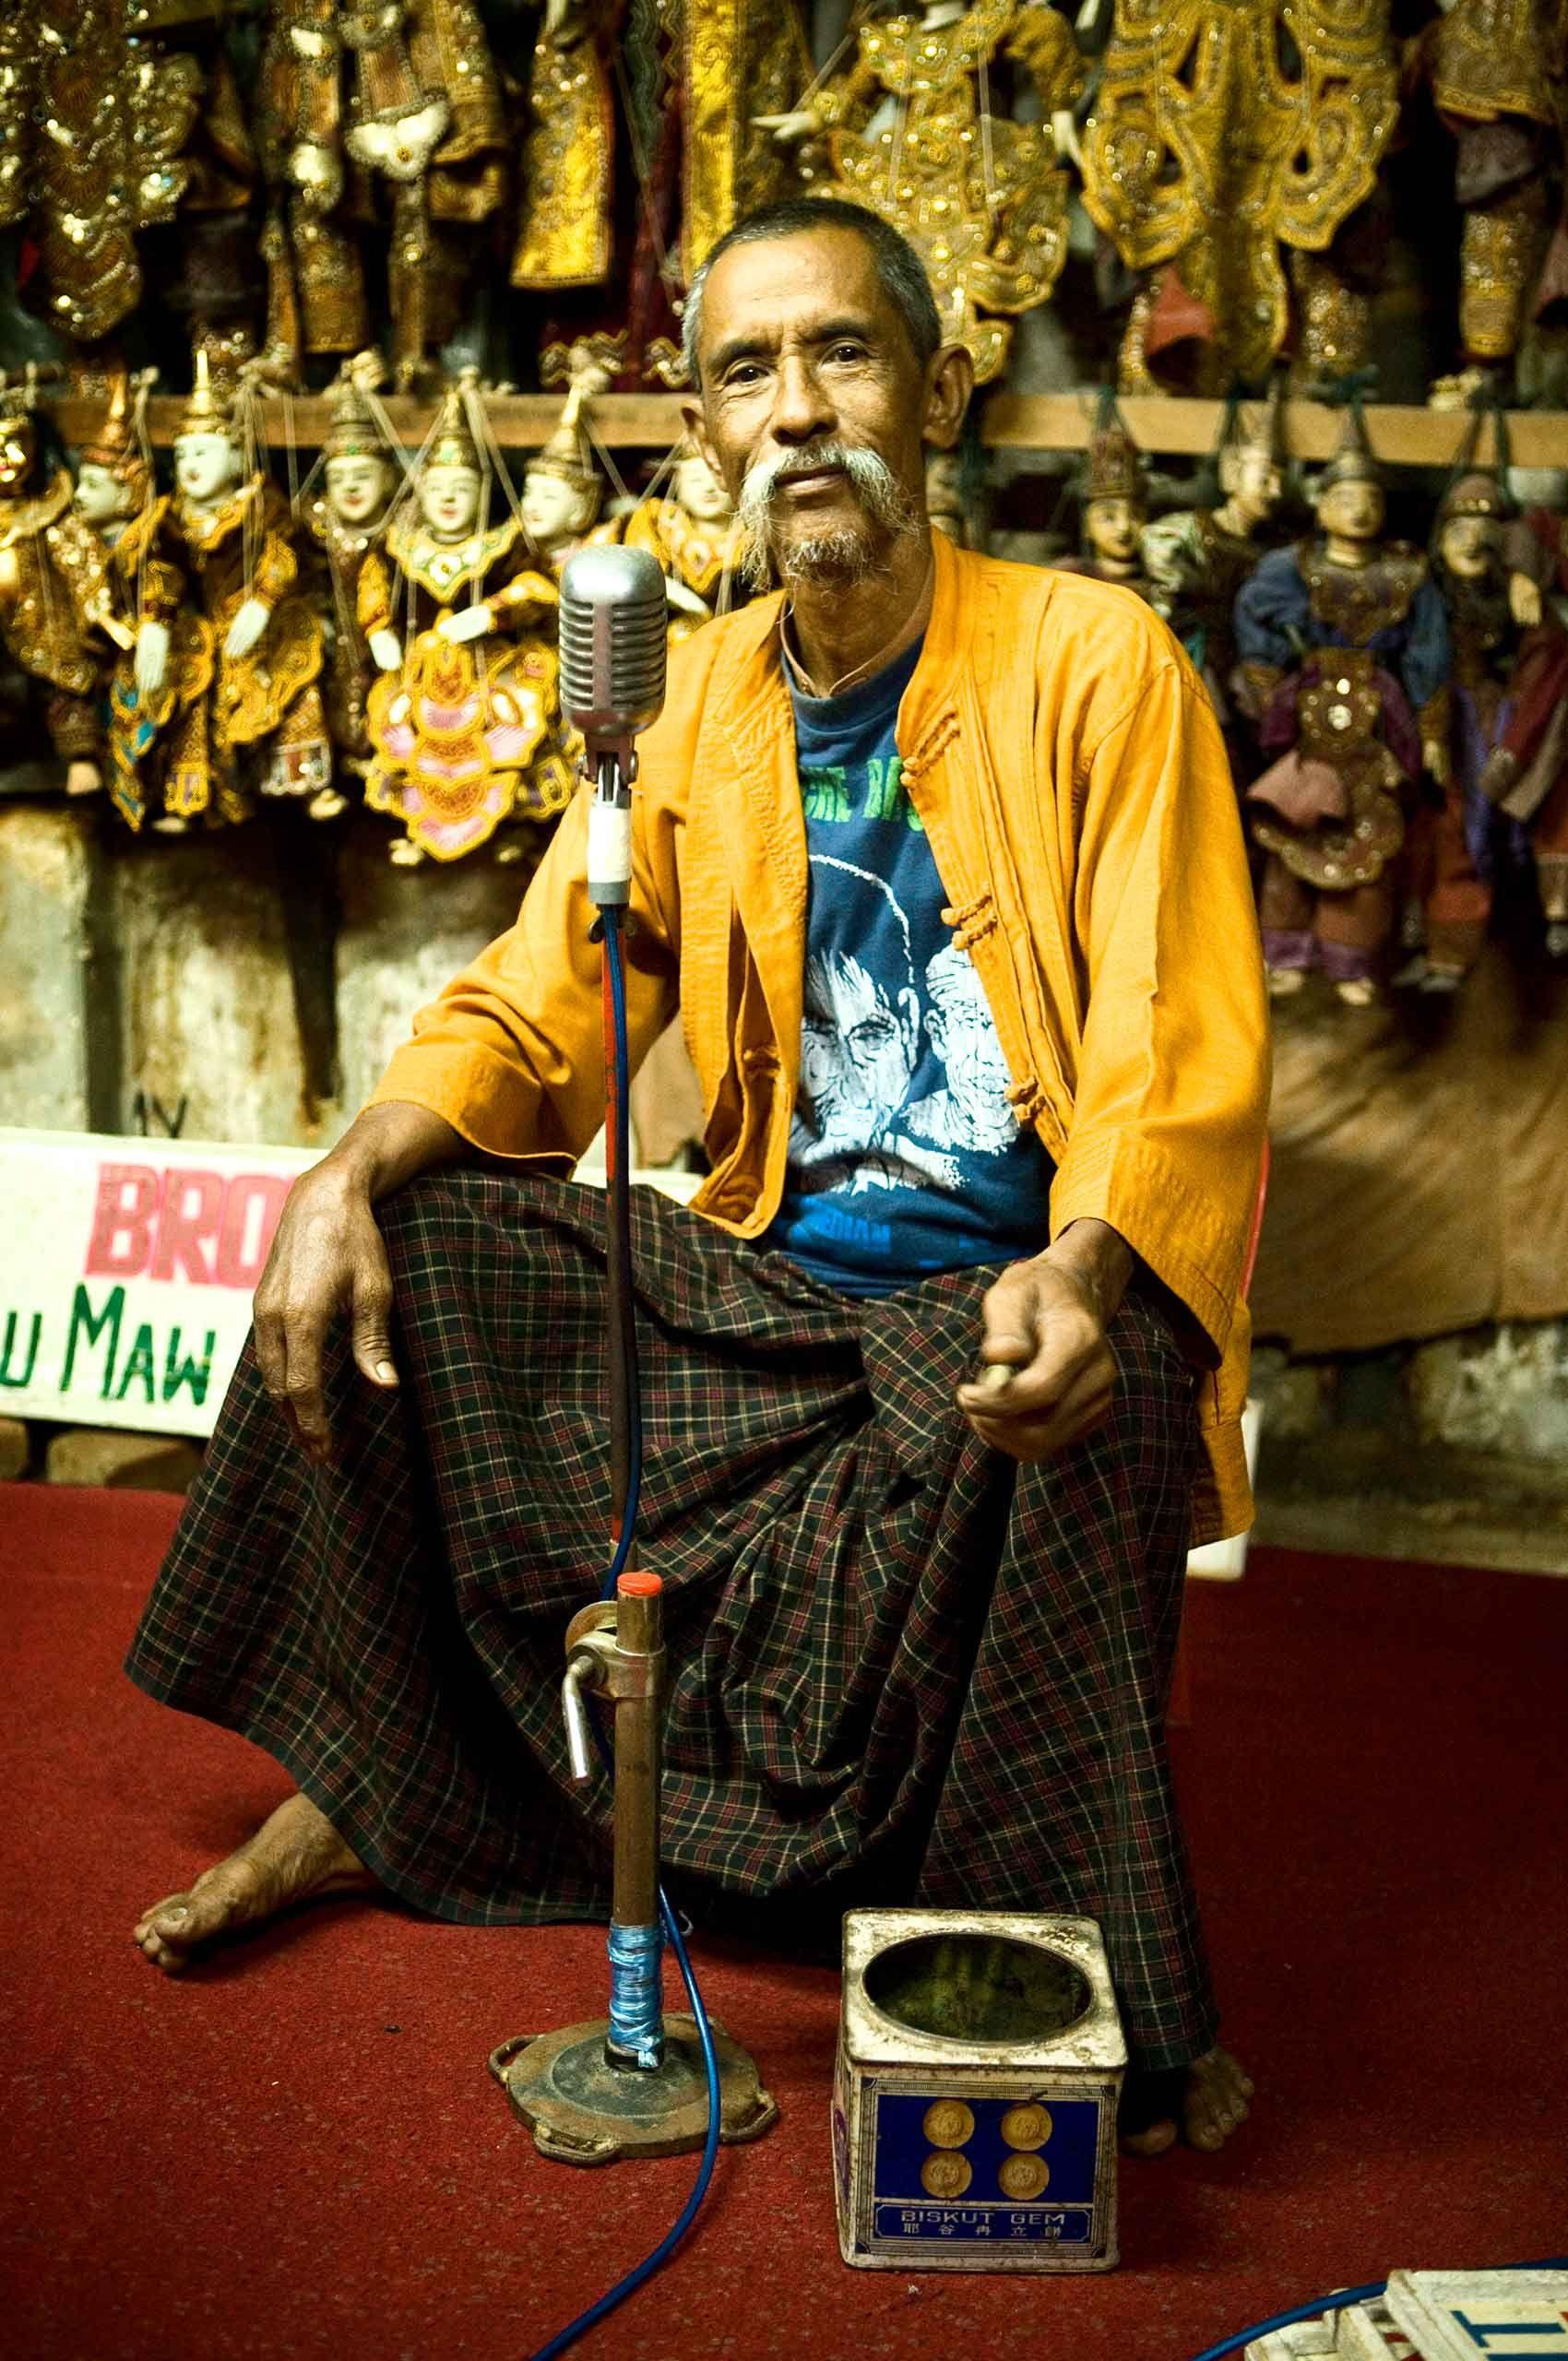 streetperformer-myanmar-by-henrikolundphotography.jpg